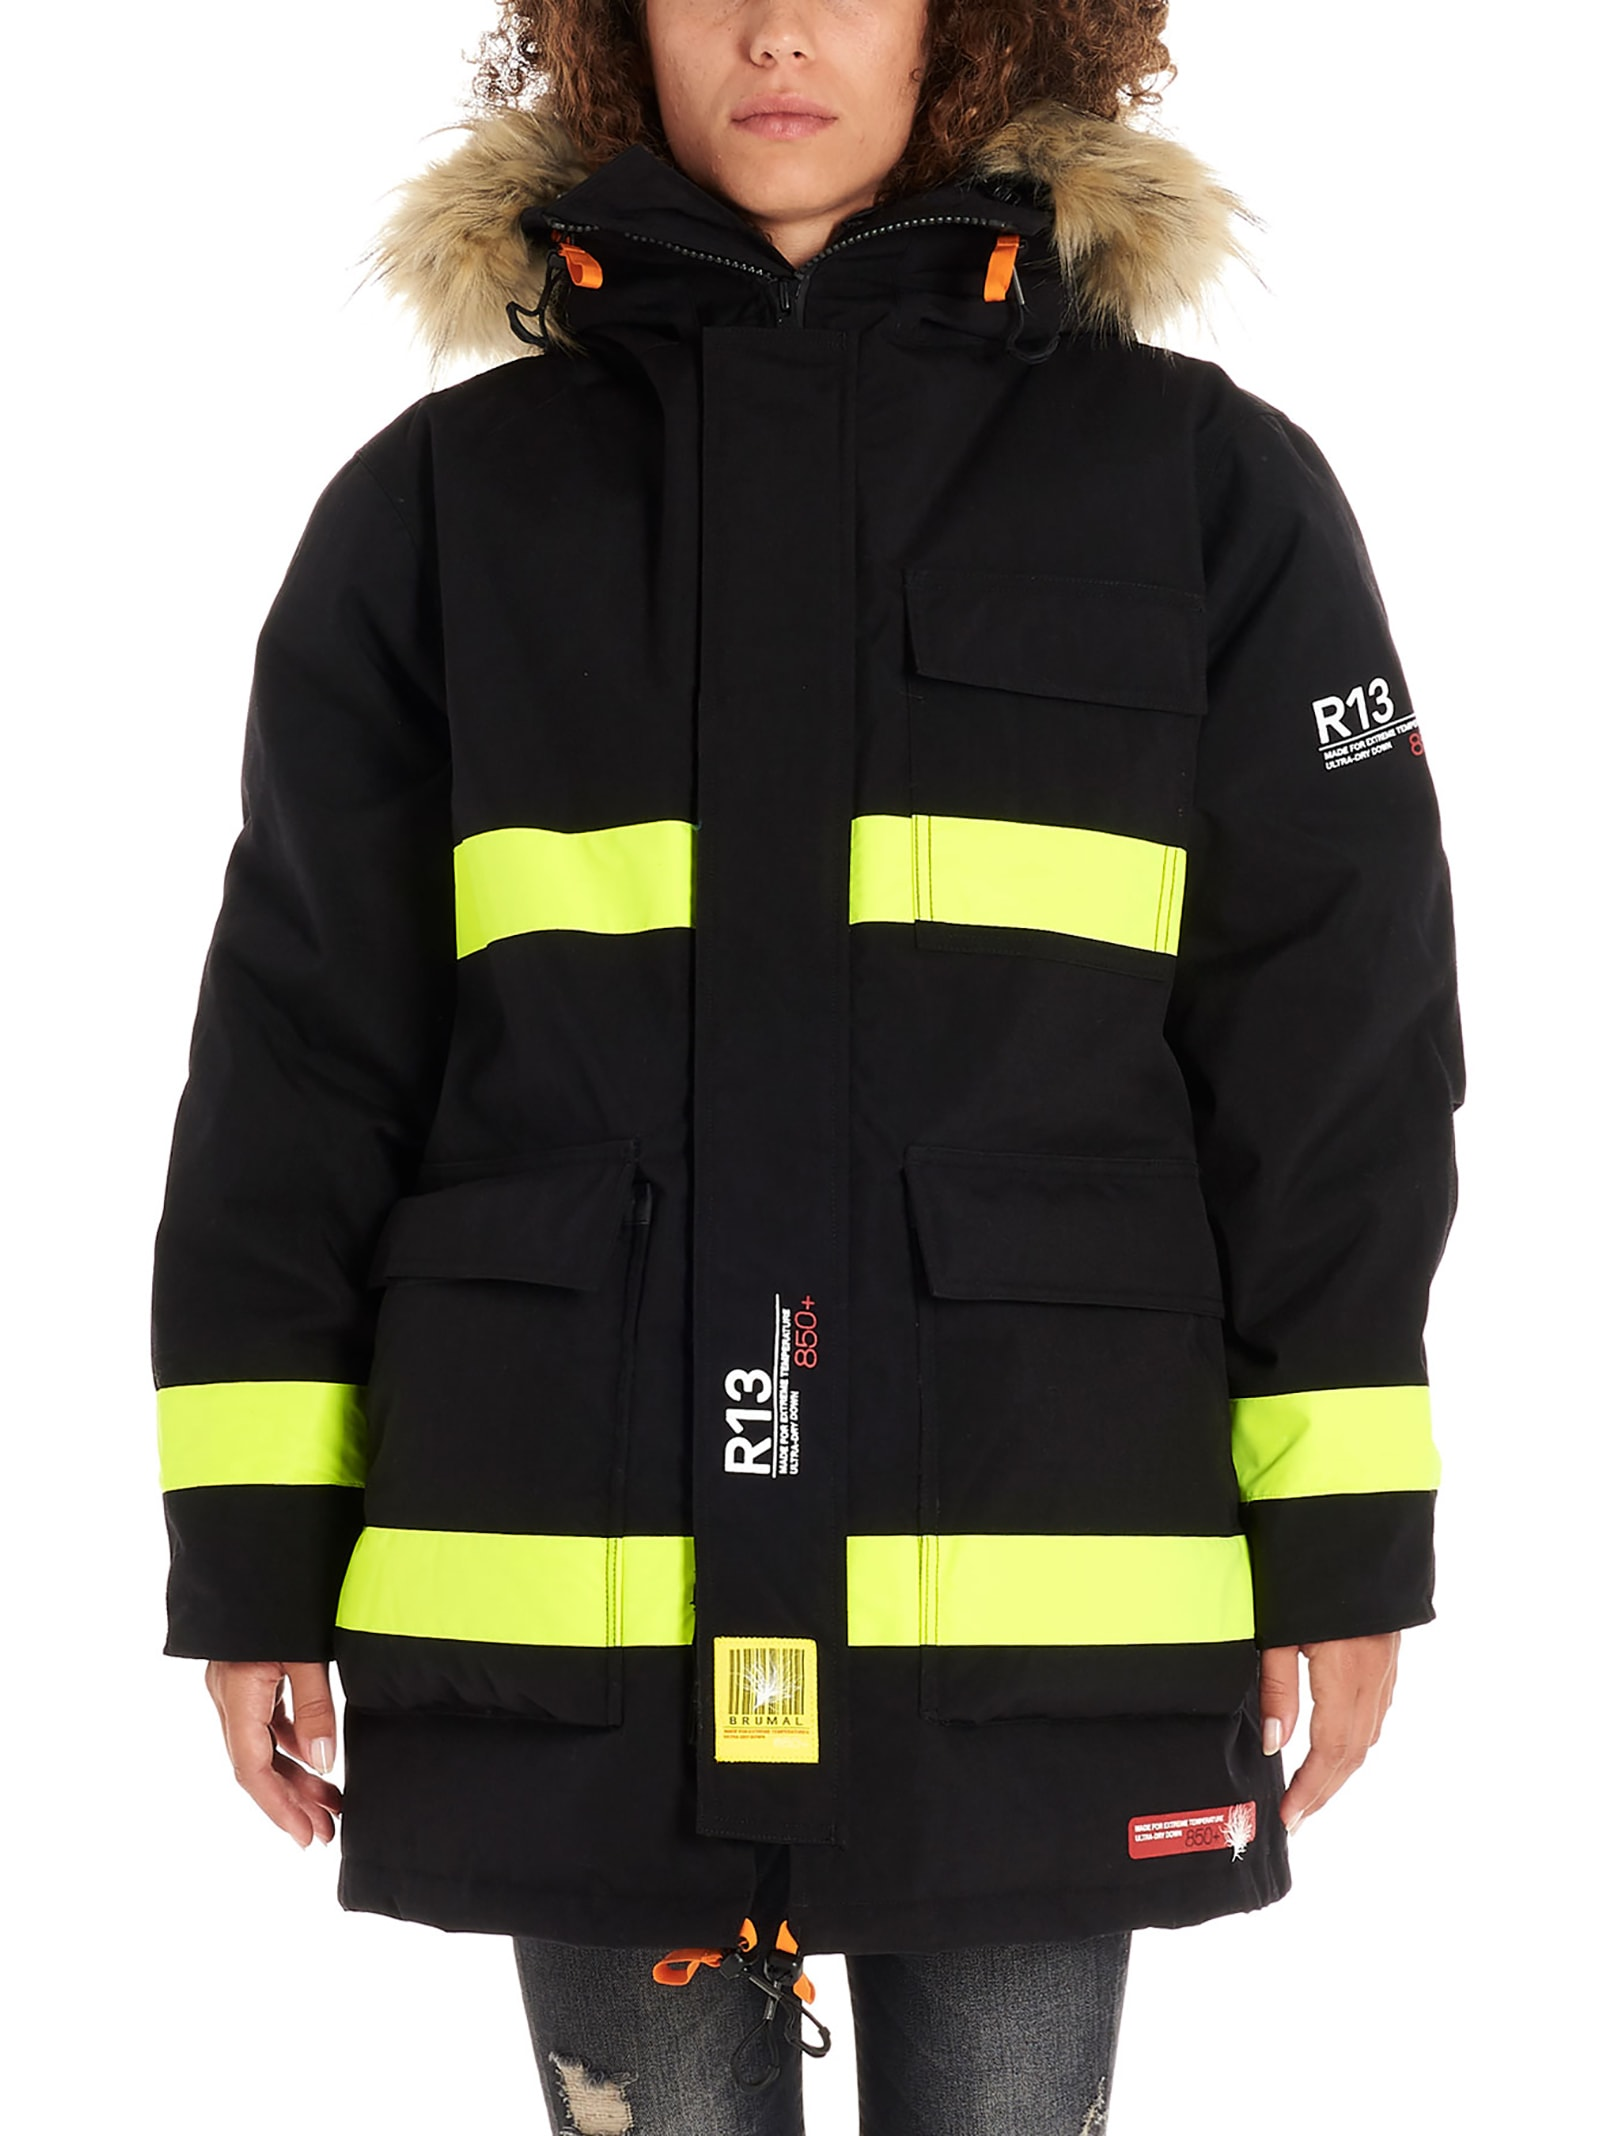 R13 fireman Parka